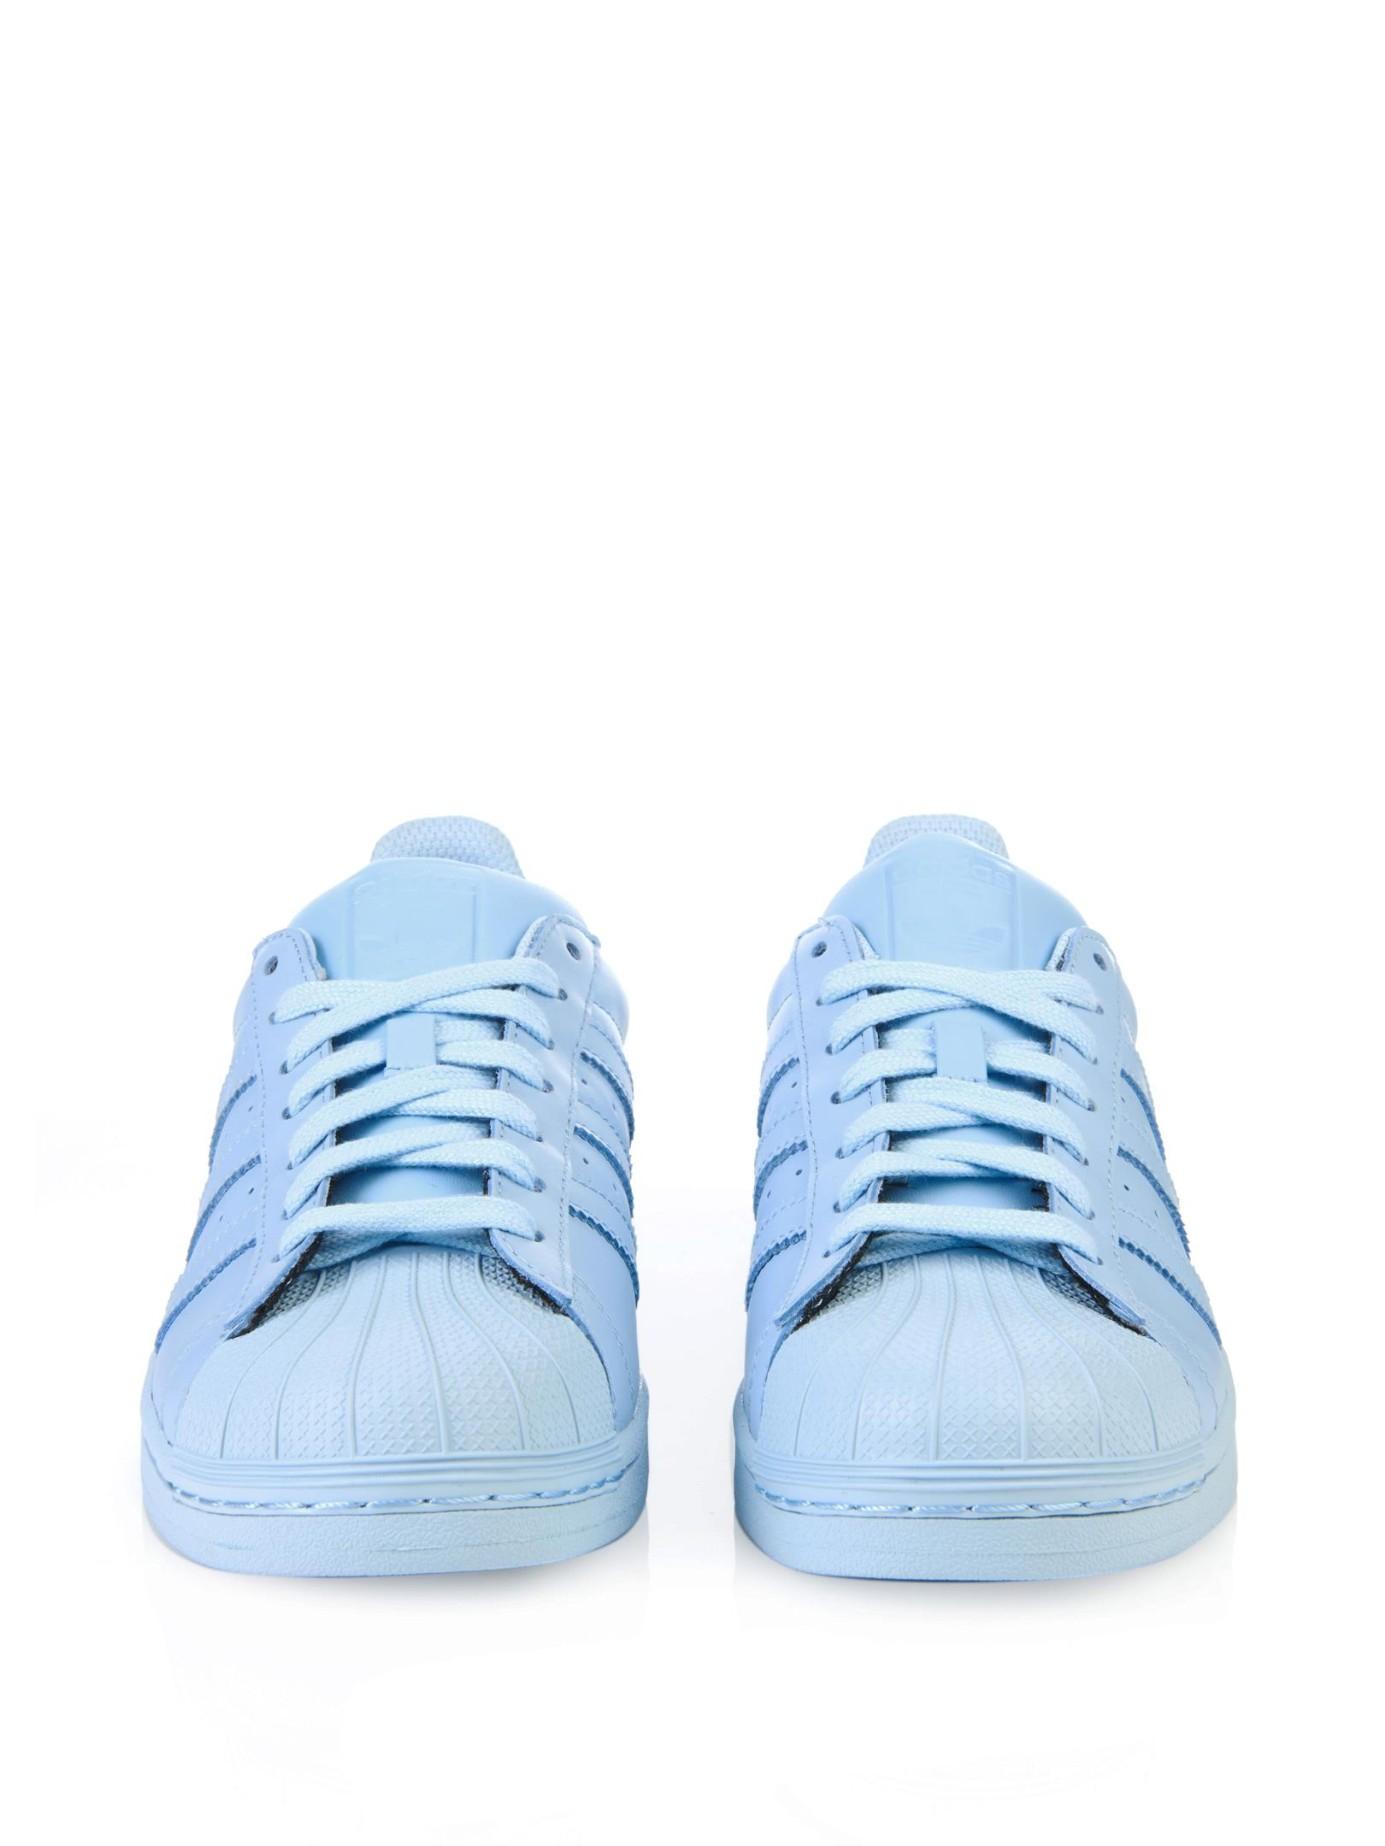 50% off adidas superstar supercolor clear blue 6b3ab 724ba